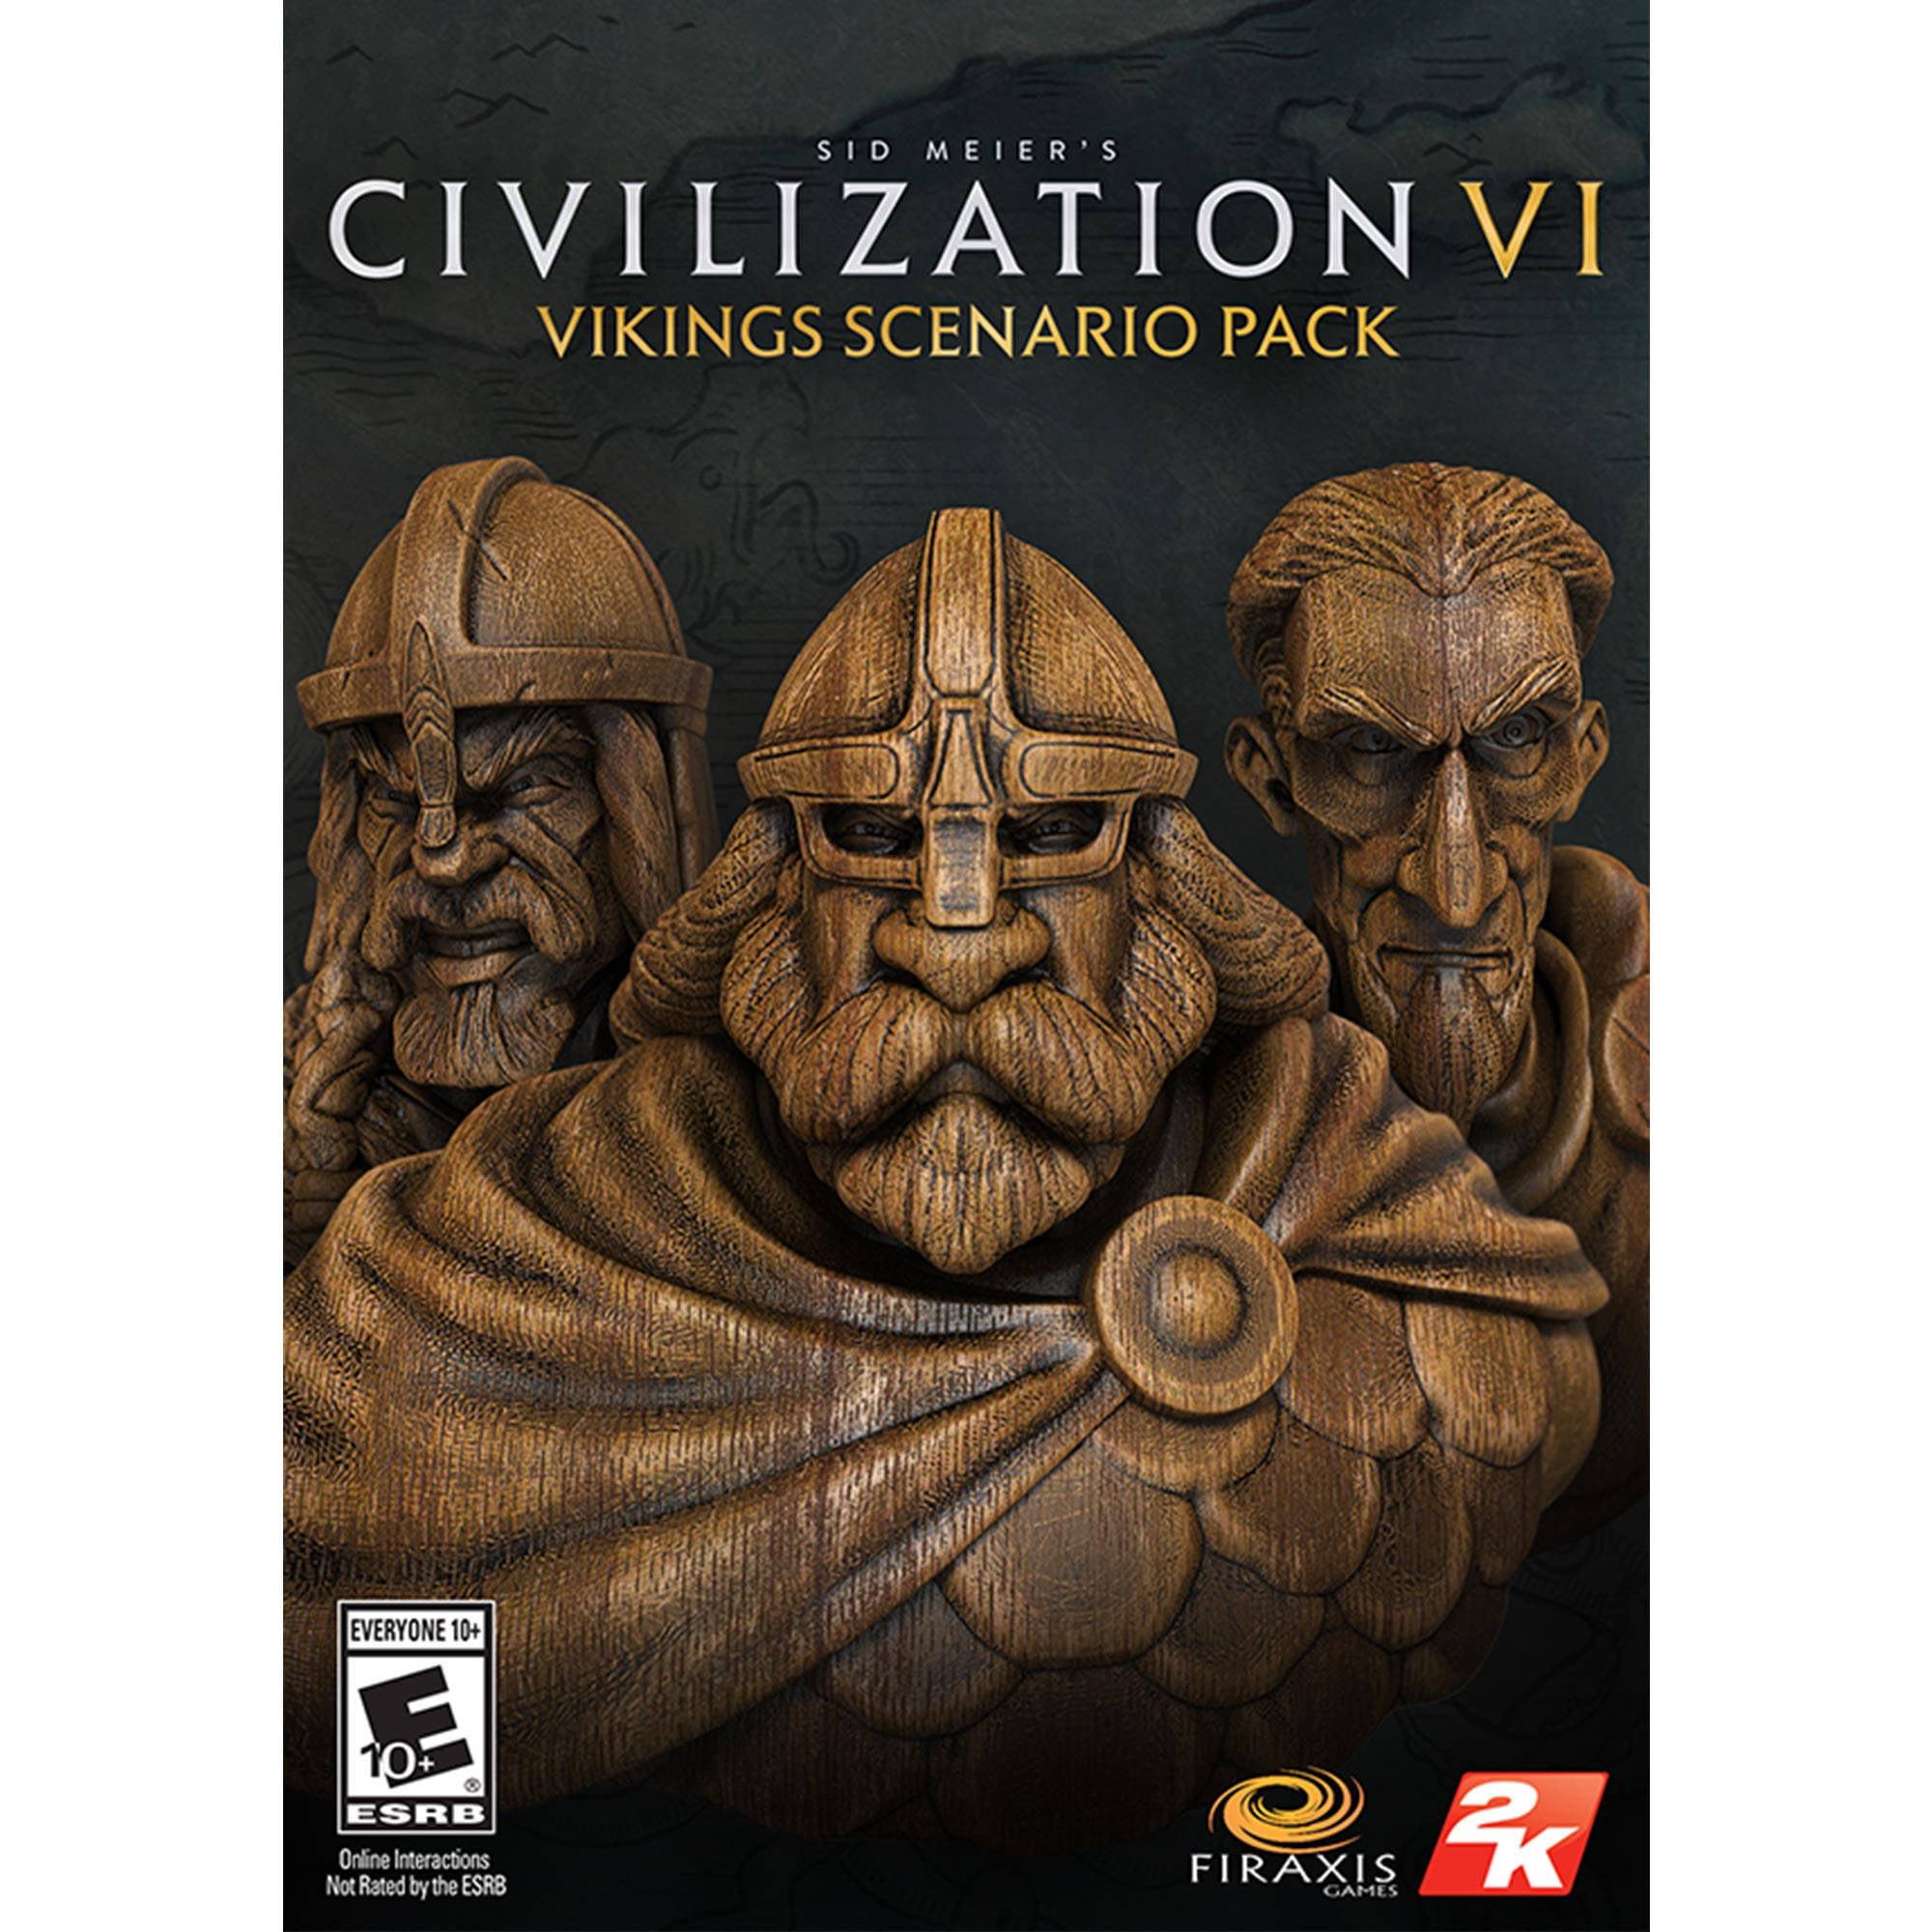 Sid Meier's Civilization VI: Viking Scenario Map Pack (PC) (Digital Download)